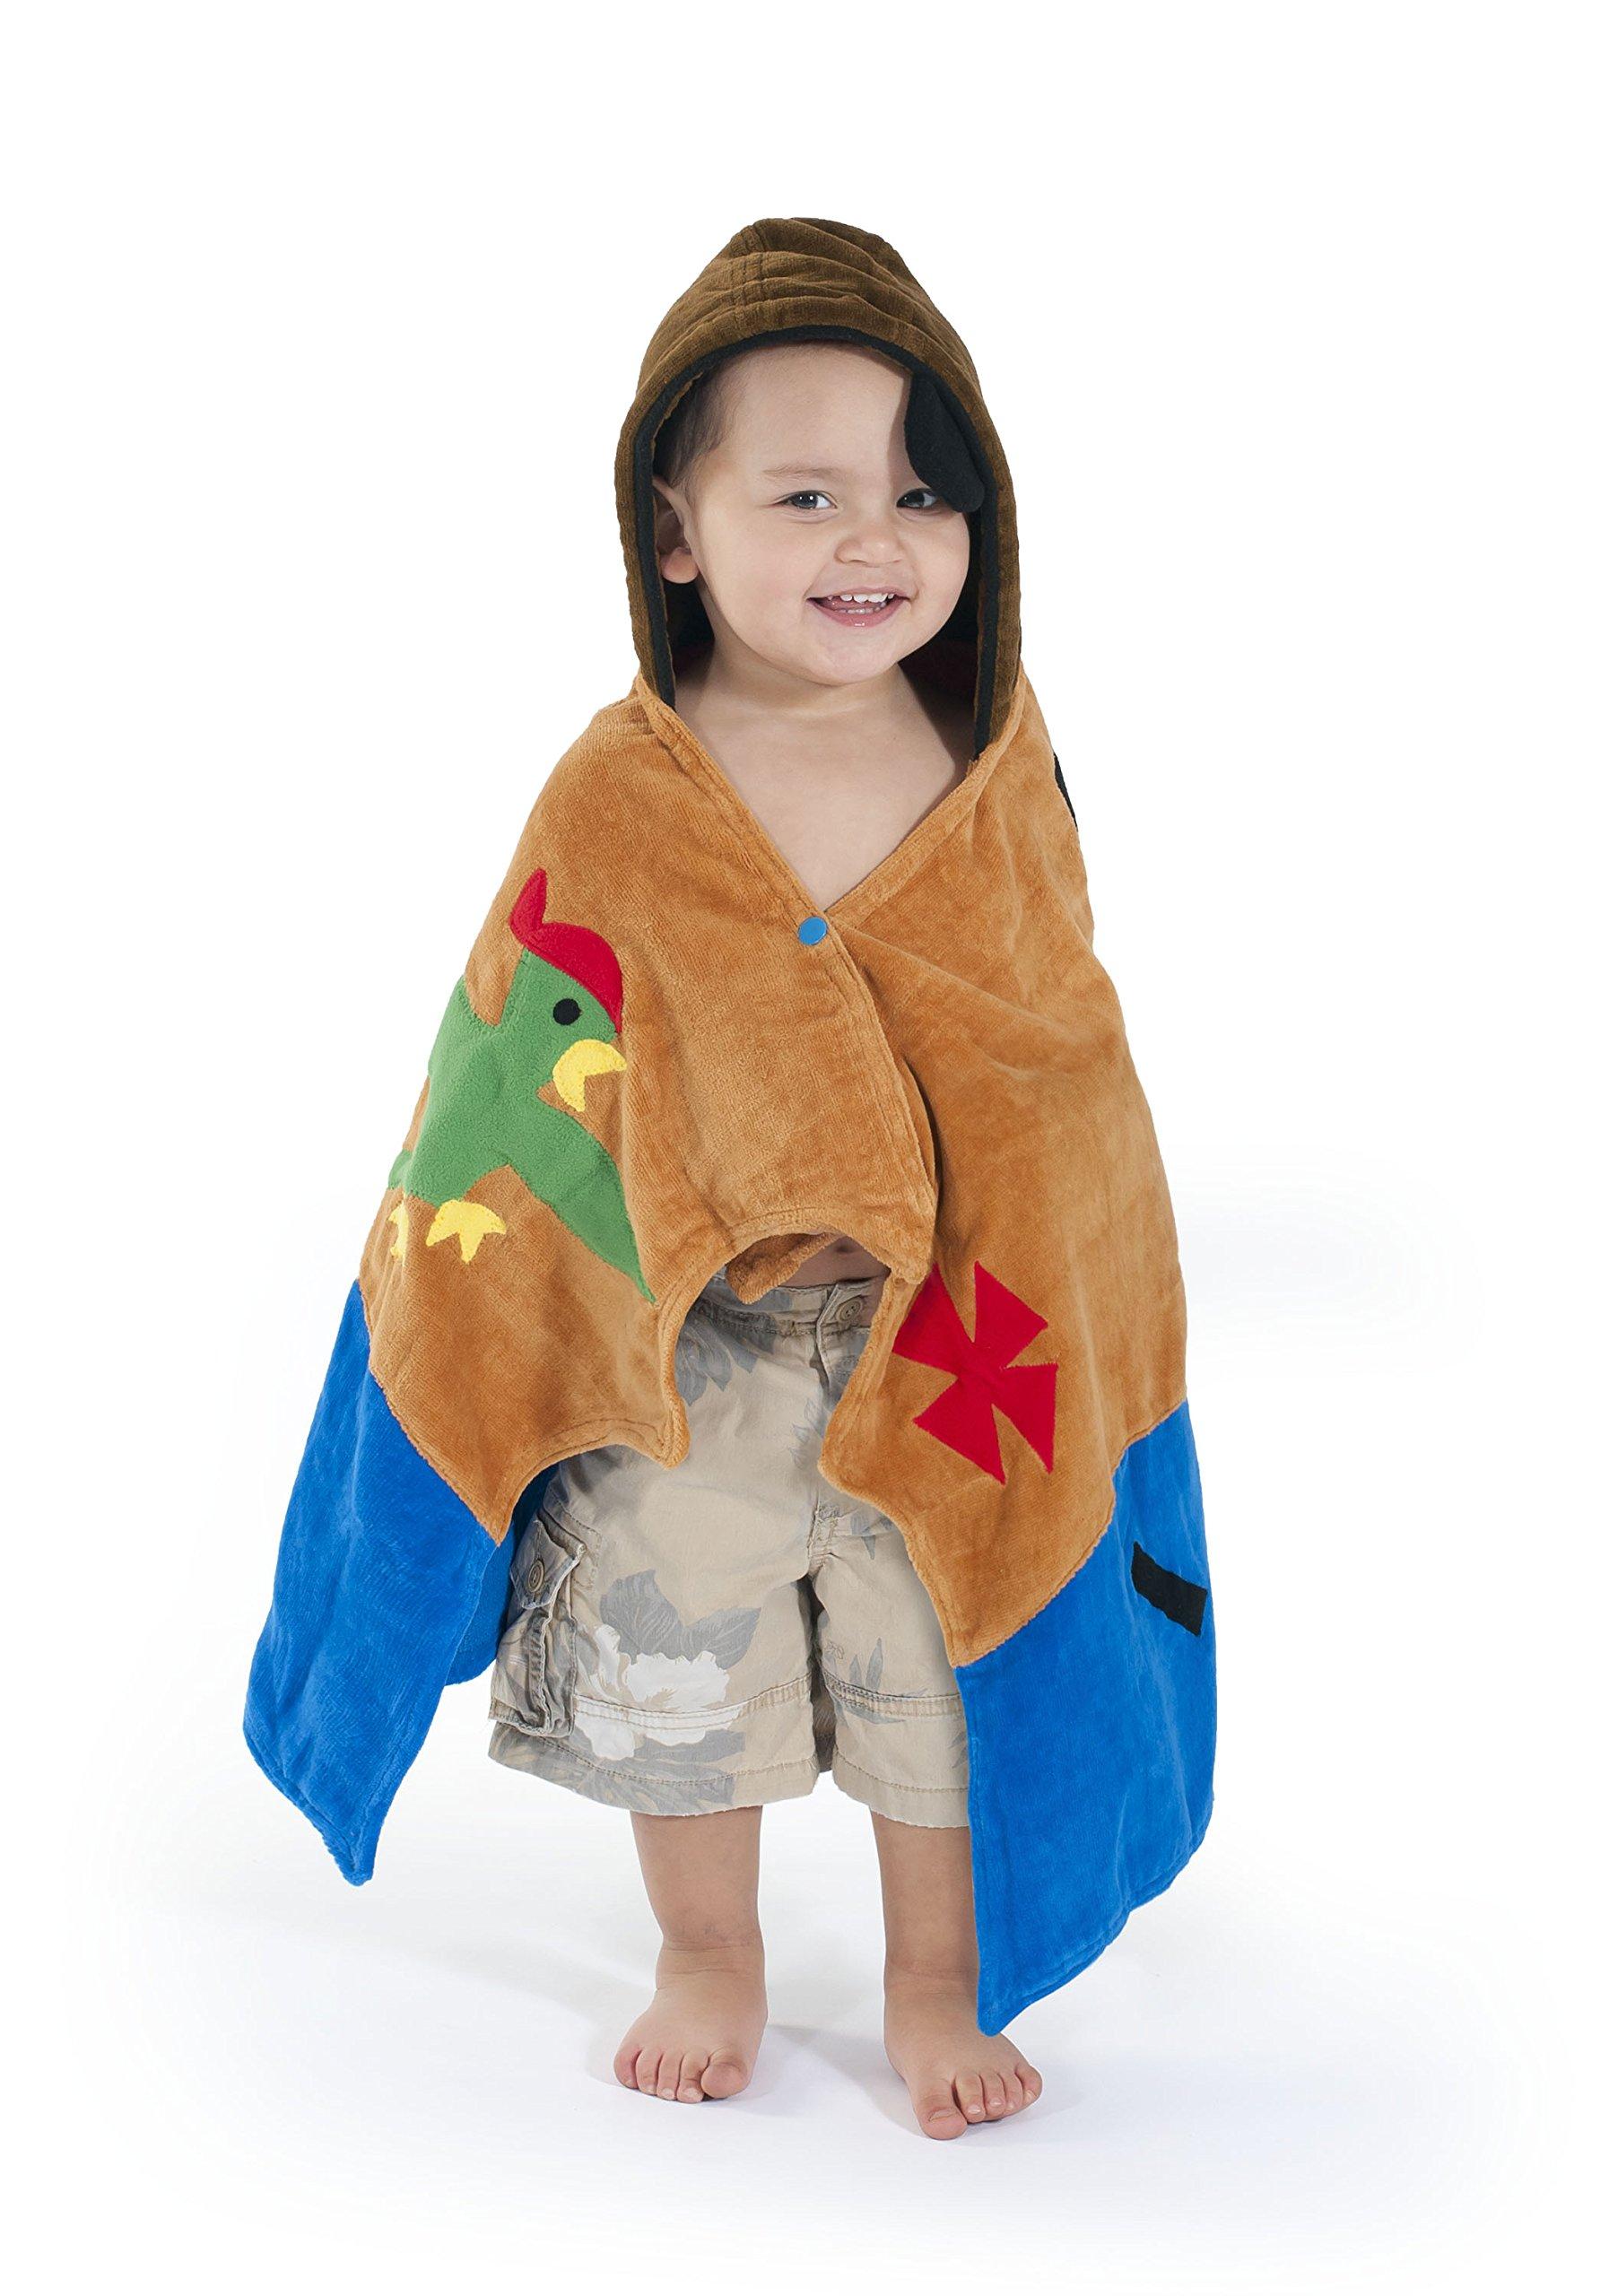 Kidorable Pirate Toddler Towel, Brown, Medium, 3-6 Years by Kidorable (Image #3)